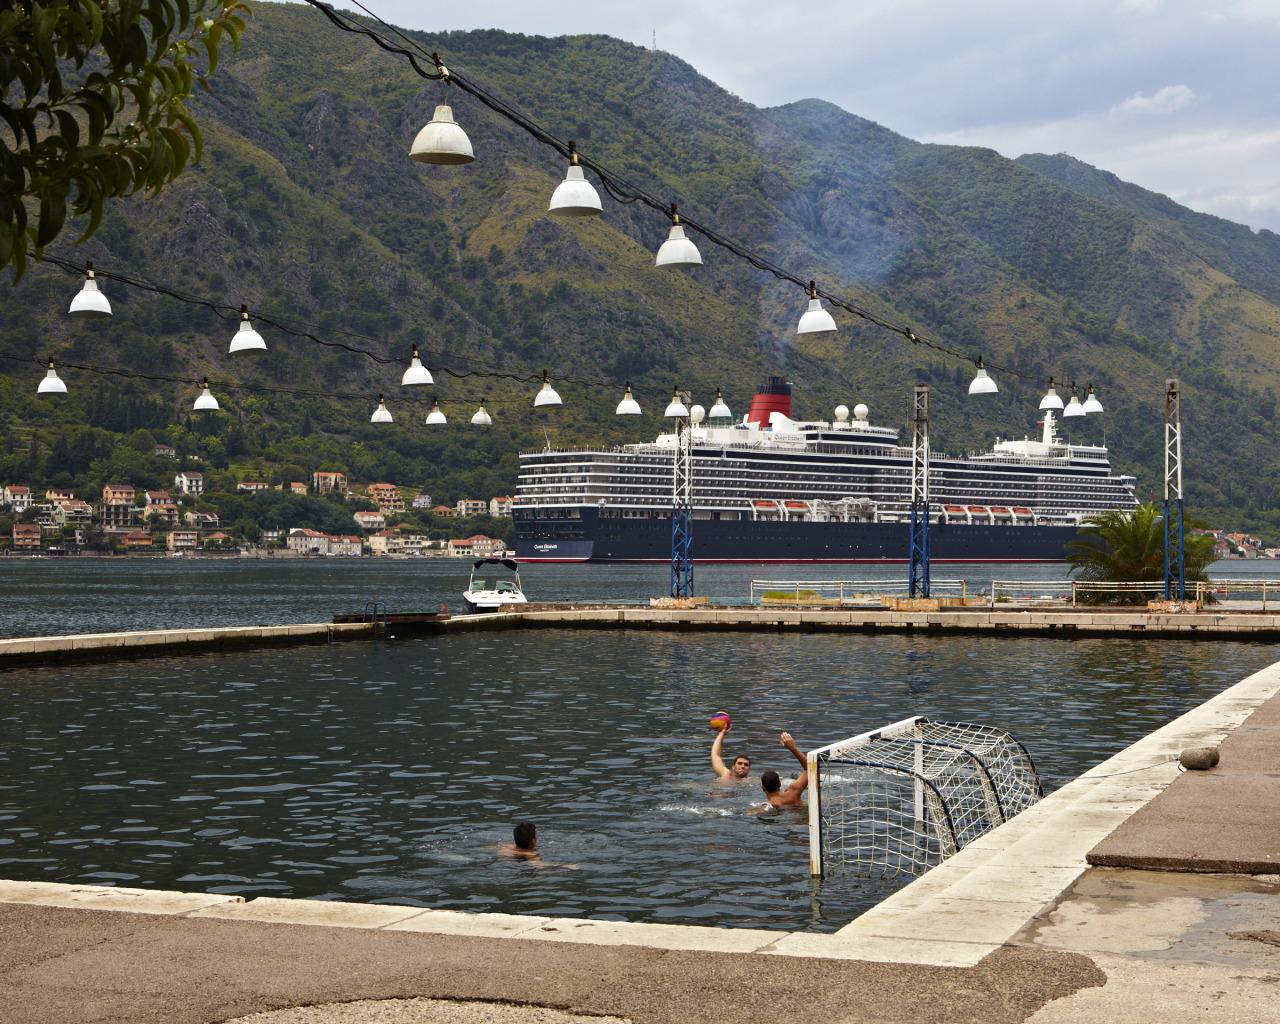 Water Polo. Kotor, Montenegro.